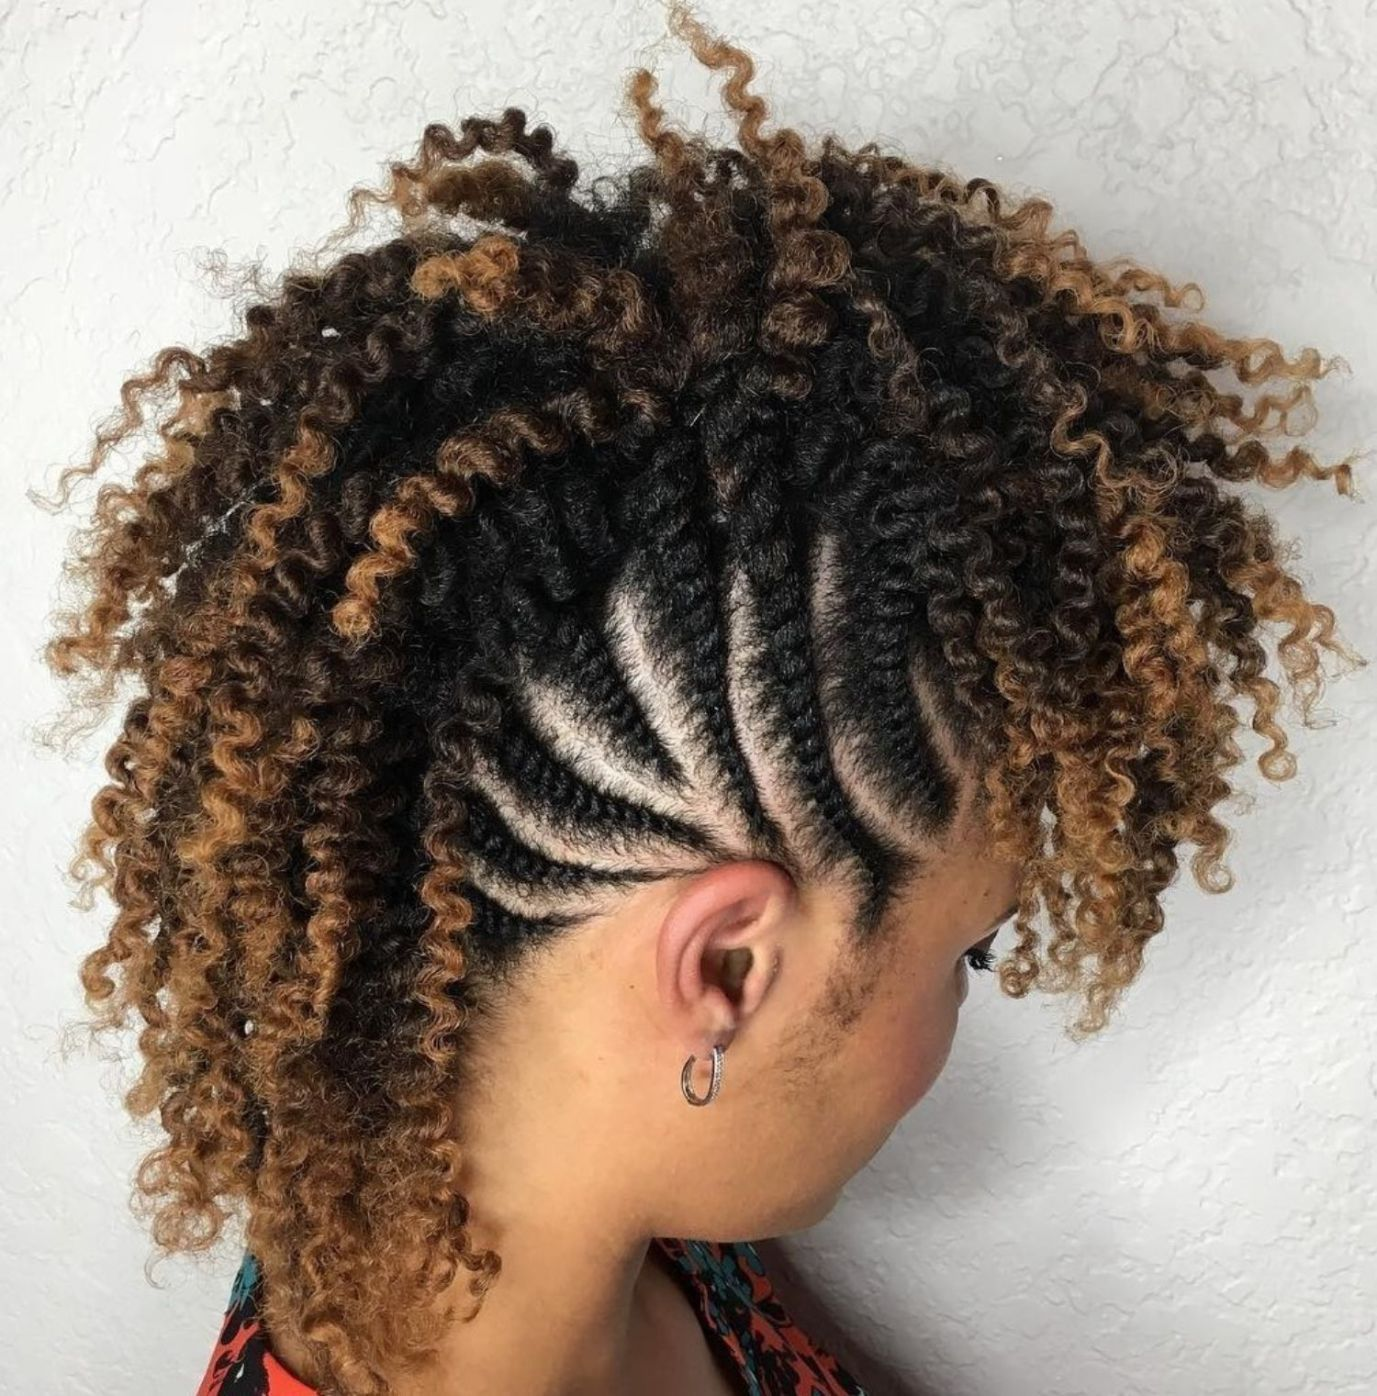 70 Best Black Braided Hairstyles That Turn Heads Braided Mohawk